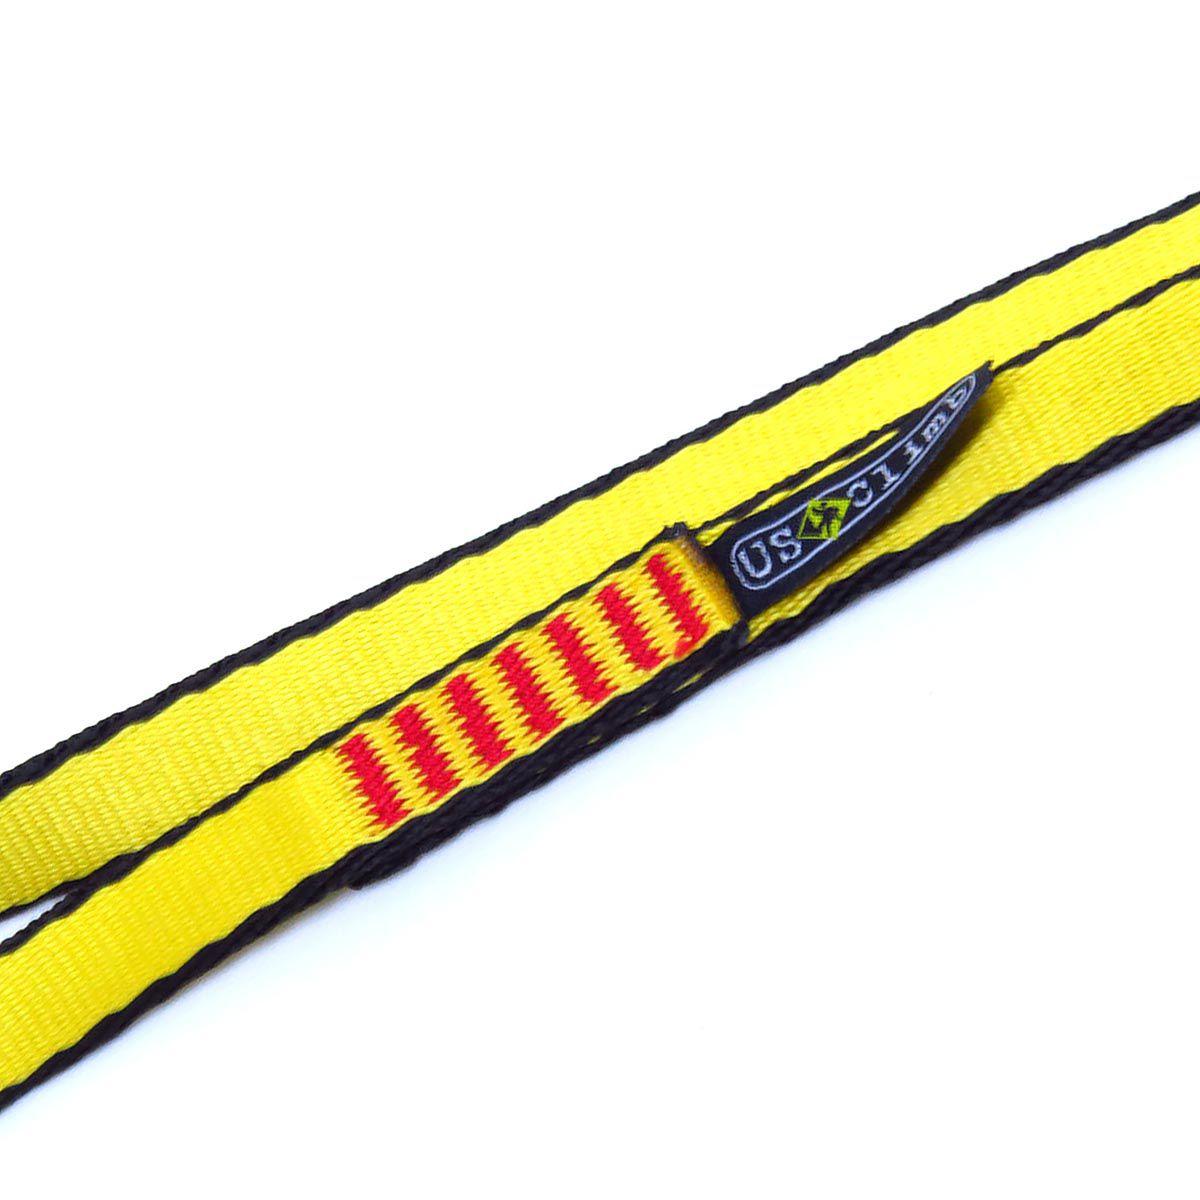 Fita Anel 150cm - USCLIMB